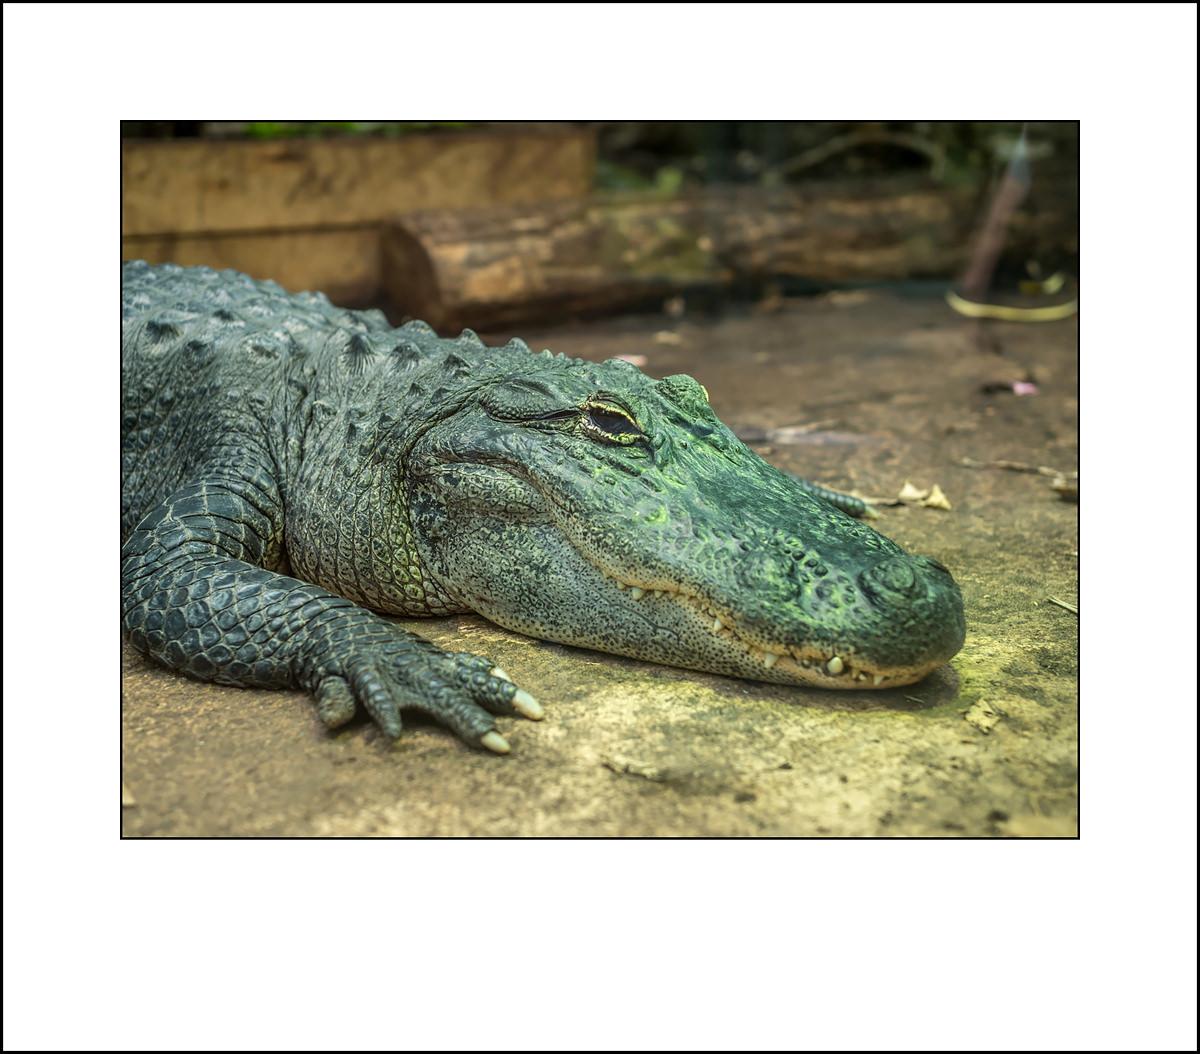 Beauval Zoo